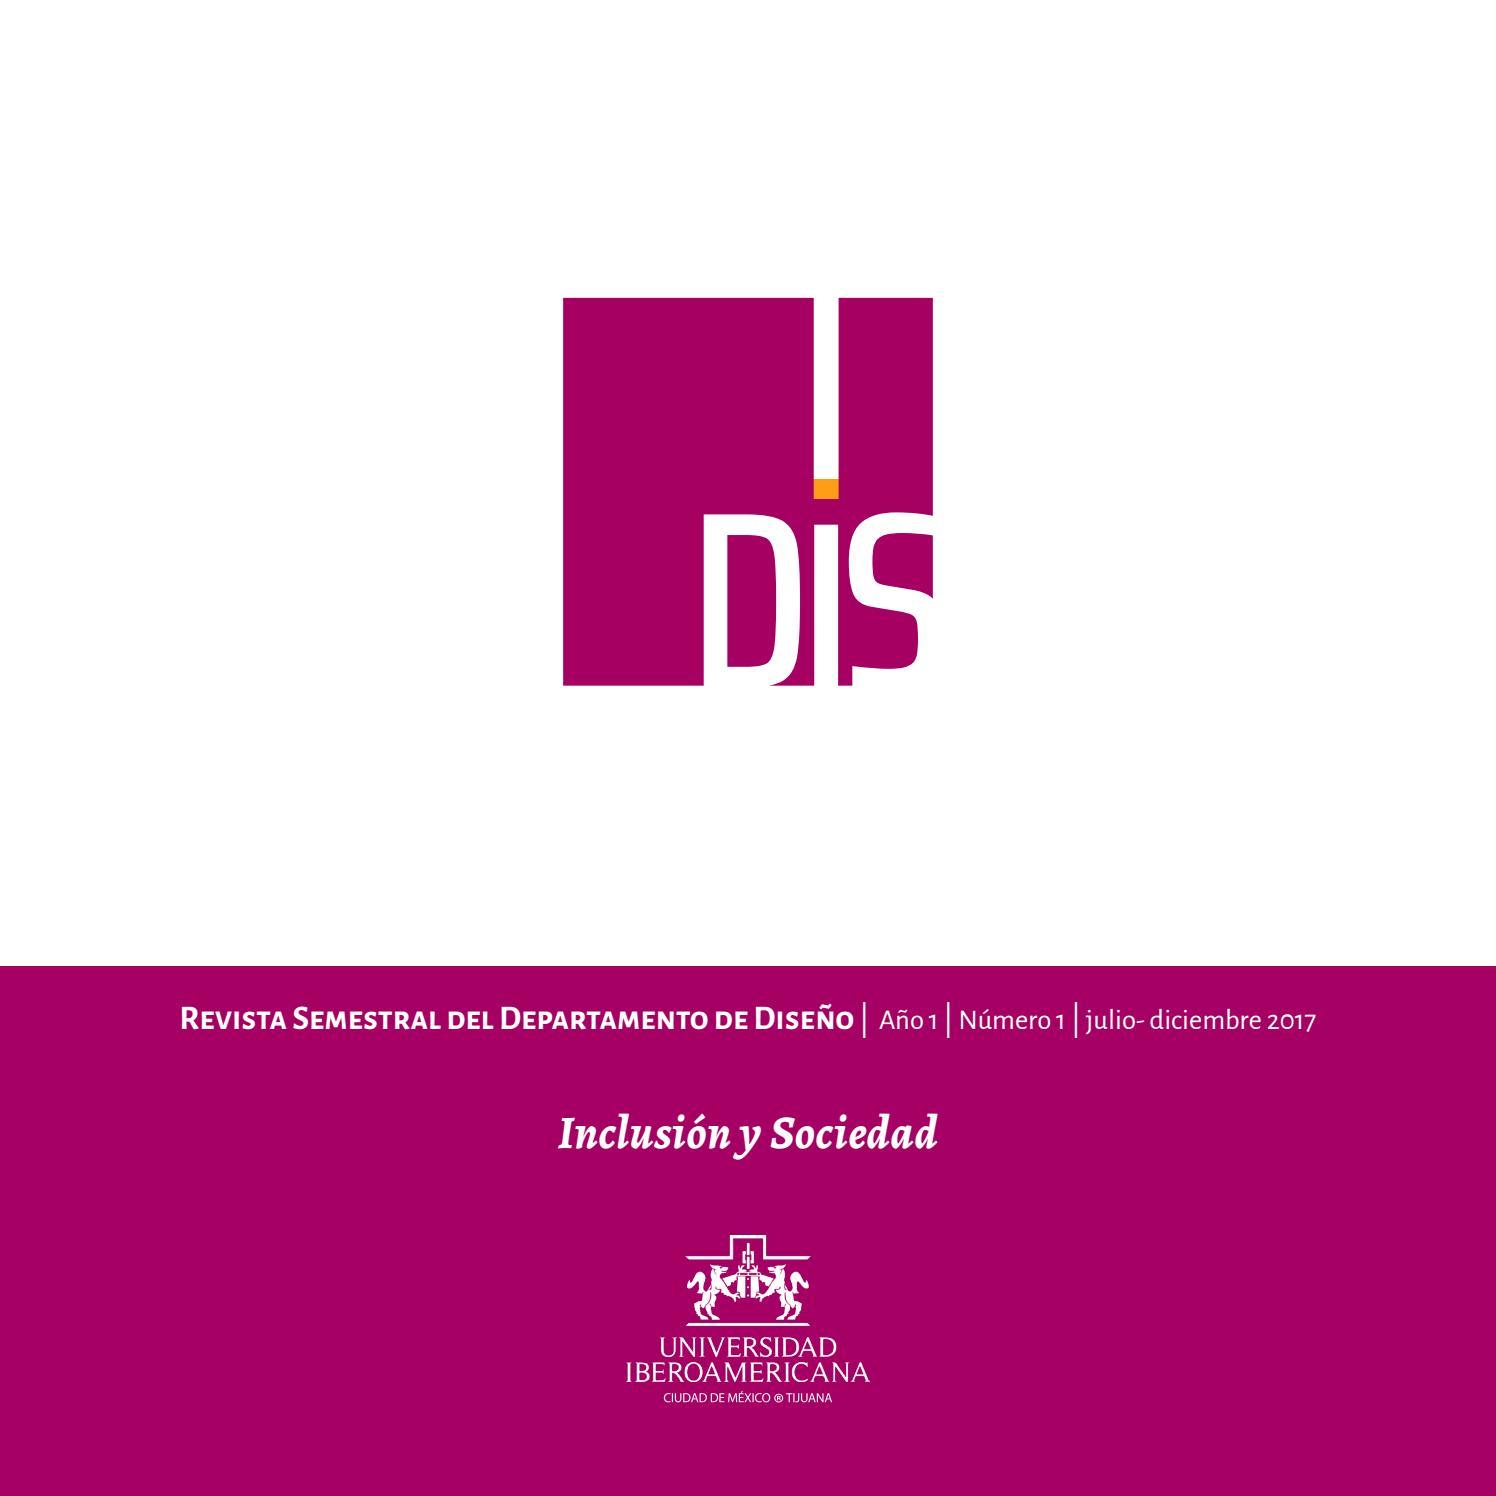 Revista dis 1 1 2017 by iberoDIS - issuu